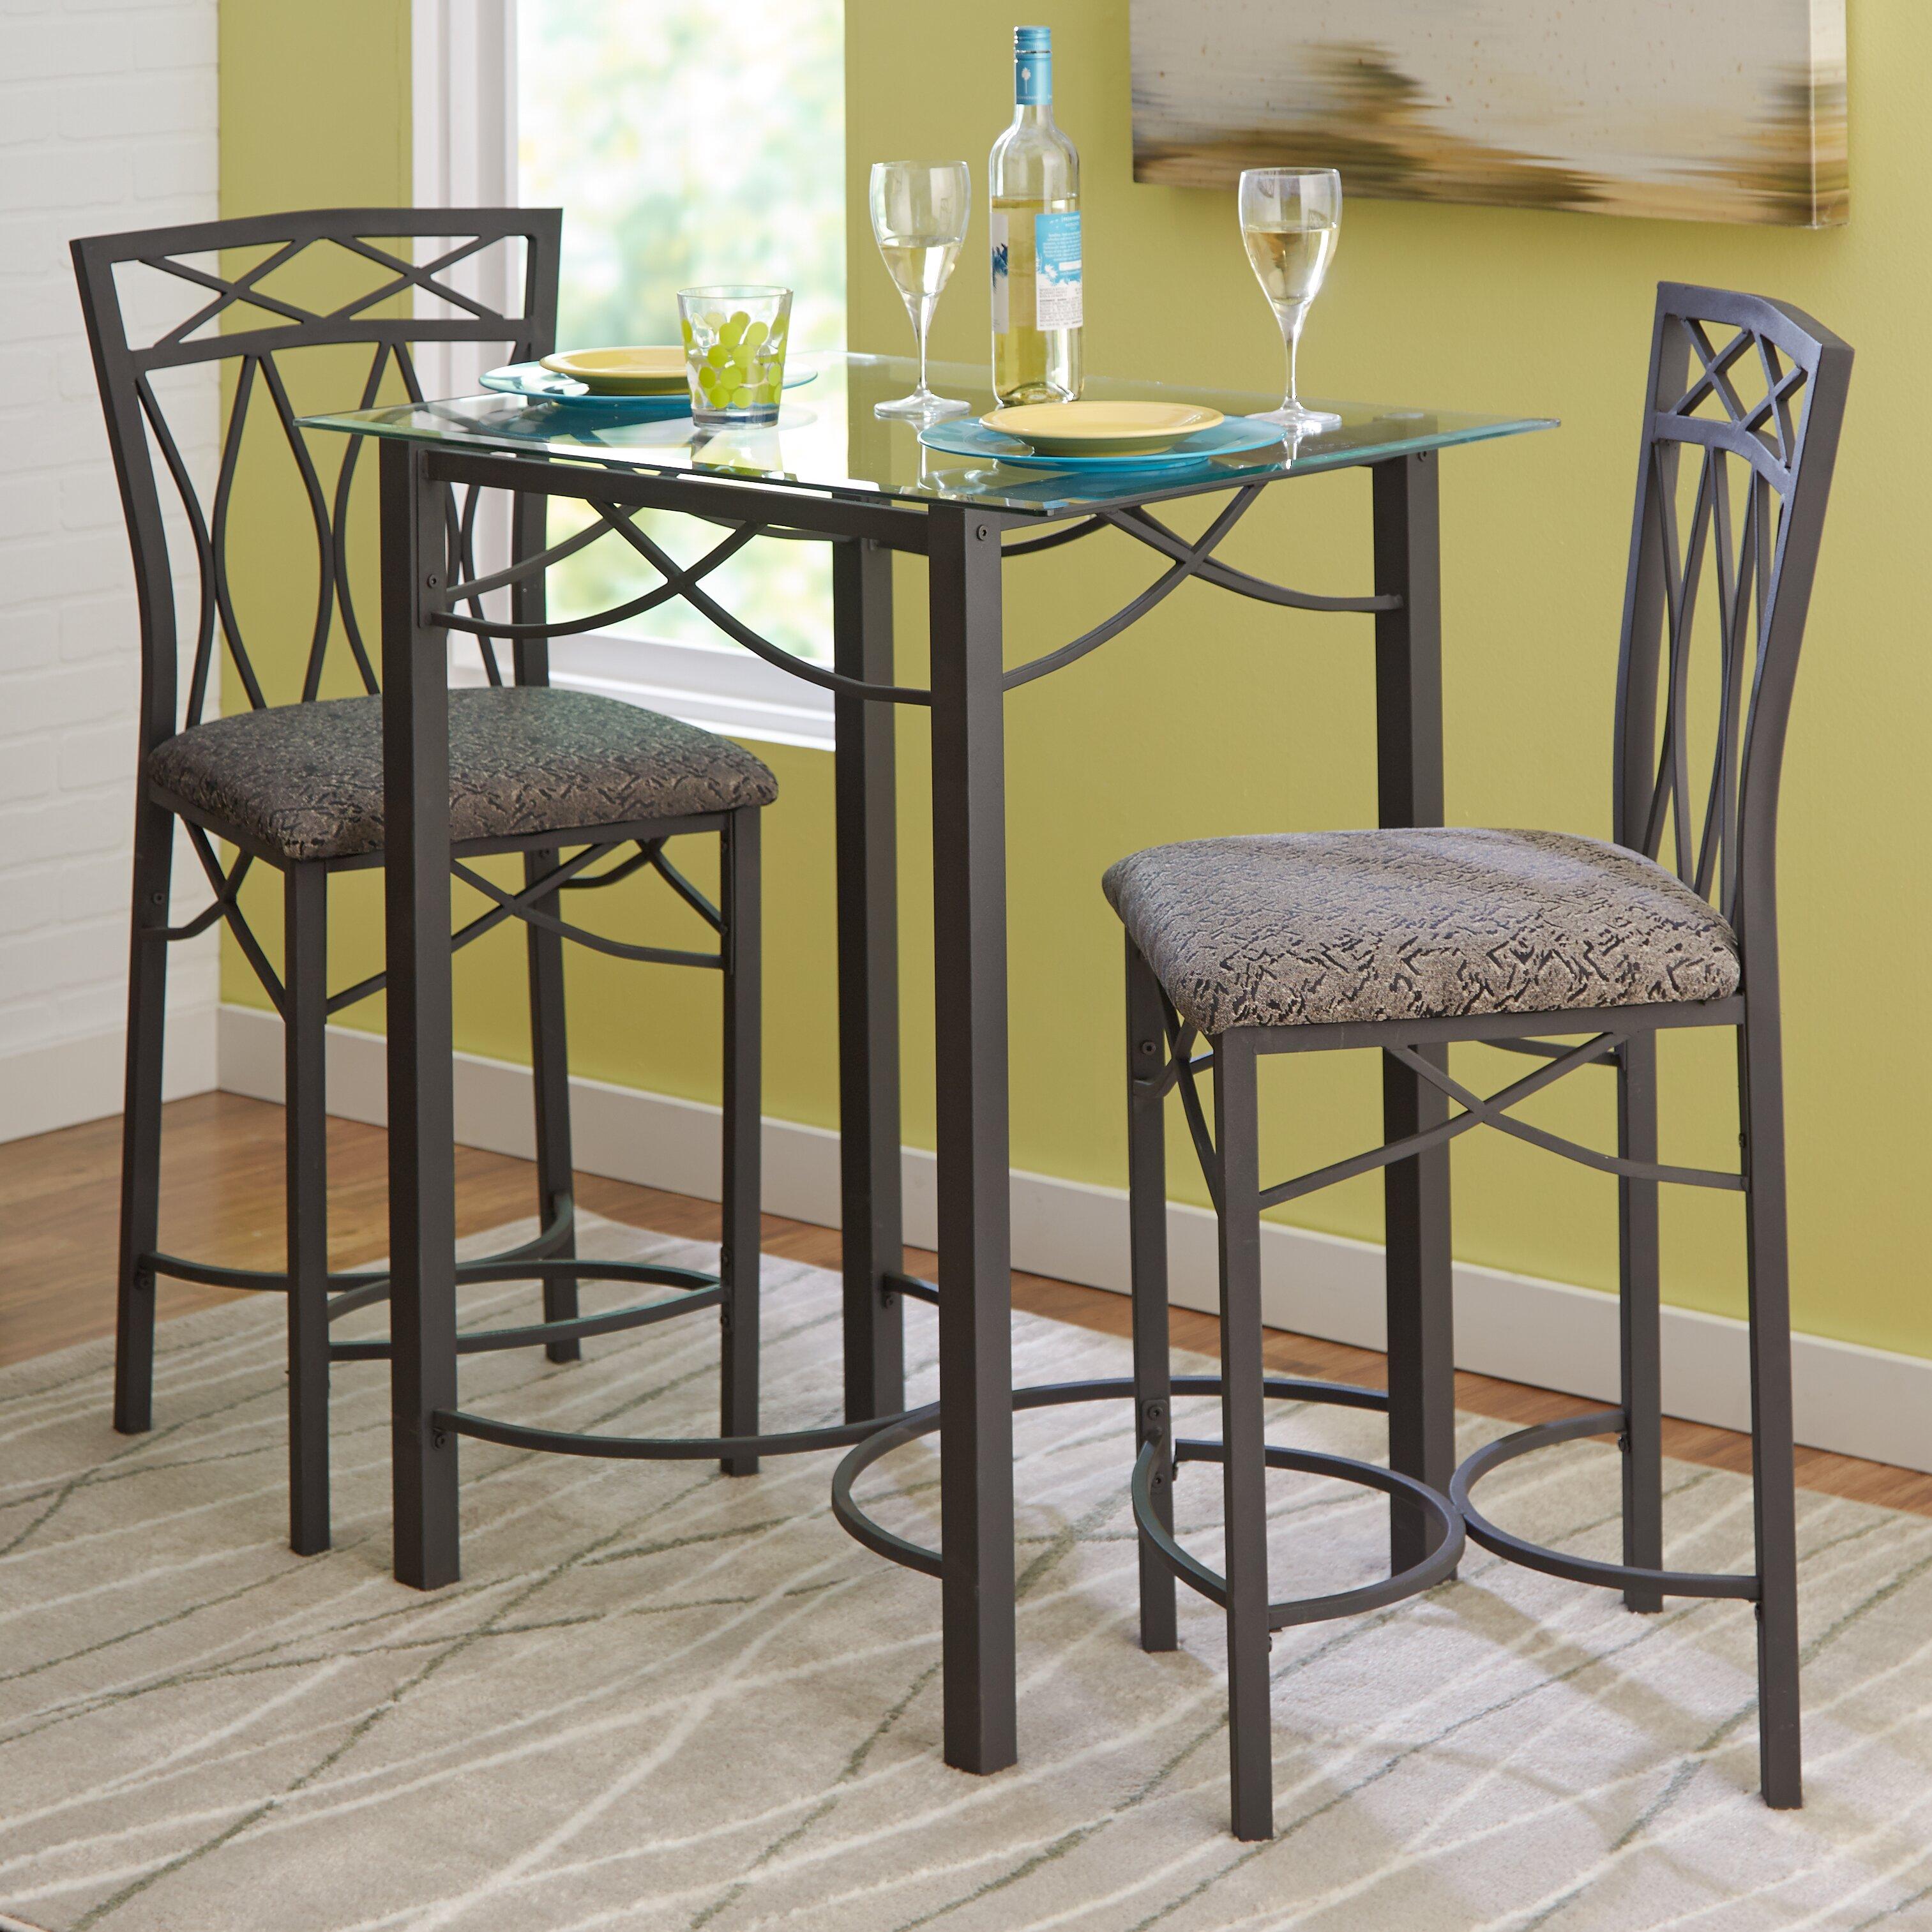 Hayley Dining Room Set Reviews - Dining Room Sets